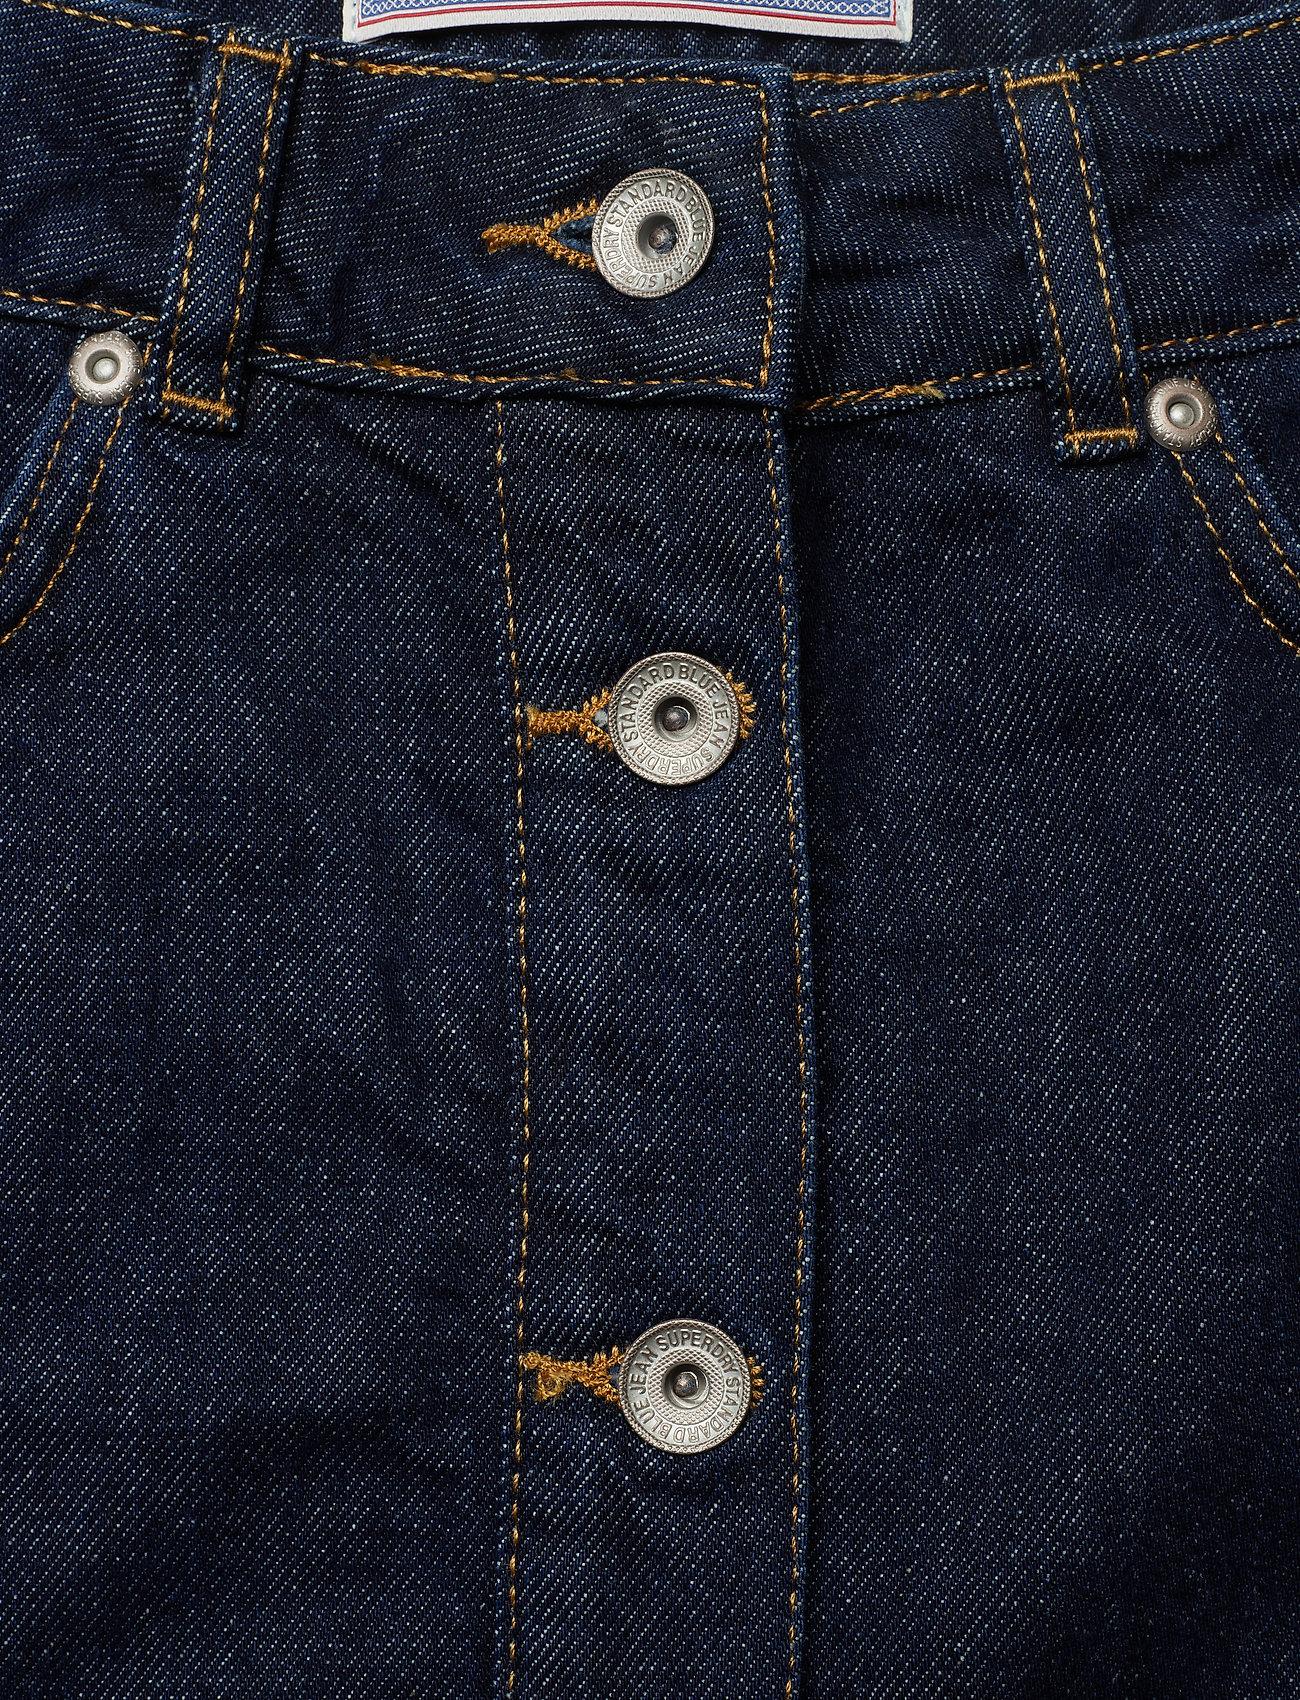 Skirt70's Denim BlueSuperdry line A A BlueSuperdry Denim line Skirt70's A Denim line QrdxthsC